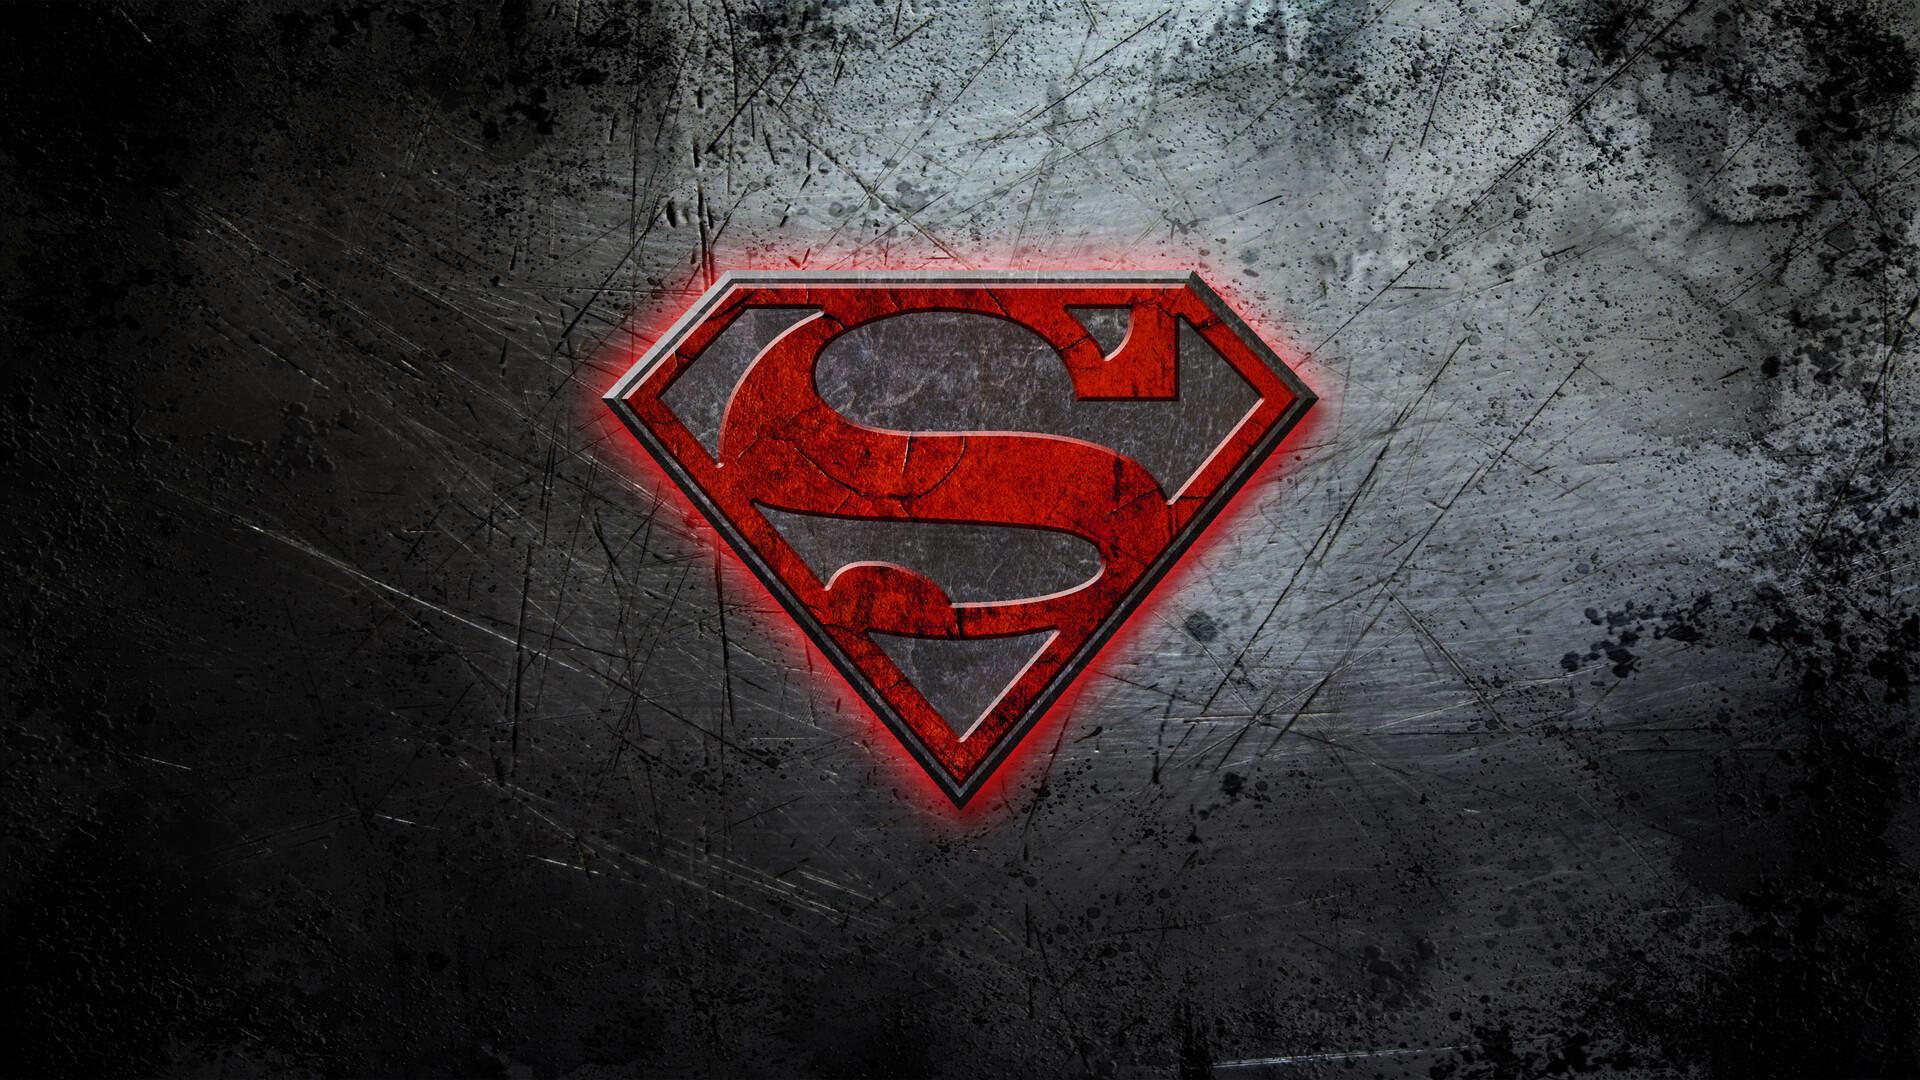 1920x1080 superman logo 4k laptop full hd 1080p hd 4k wallpapers superman logo 4k 0fg voltagebd Gallery